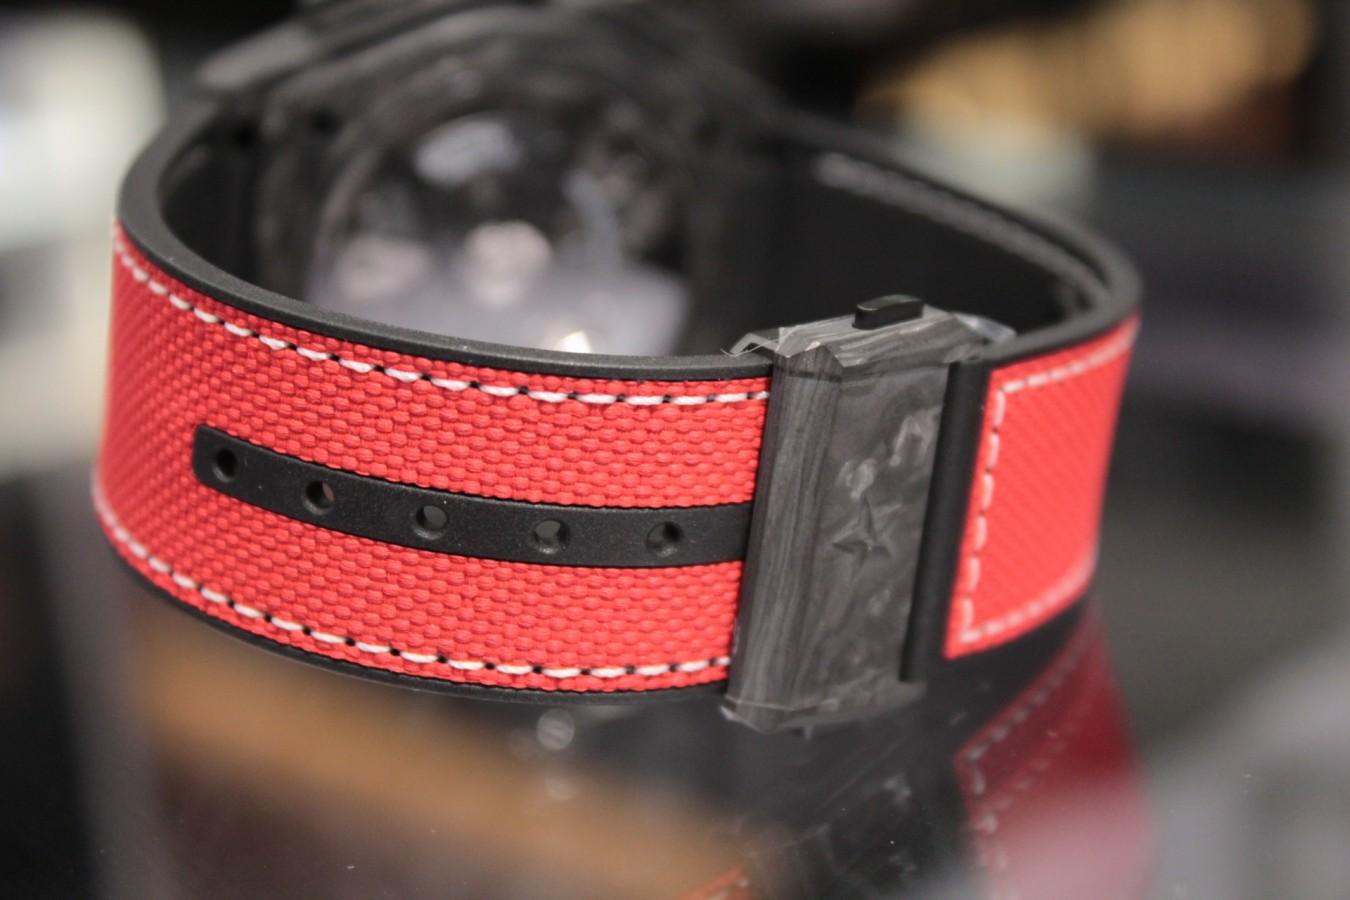 IMG_5902 赤と黒のコントラストがカッコ良い!?世界200本限定のスペシャルモデル「デファイ エル・プリメロ21 カール・コックス エディション」 - DEFY